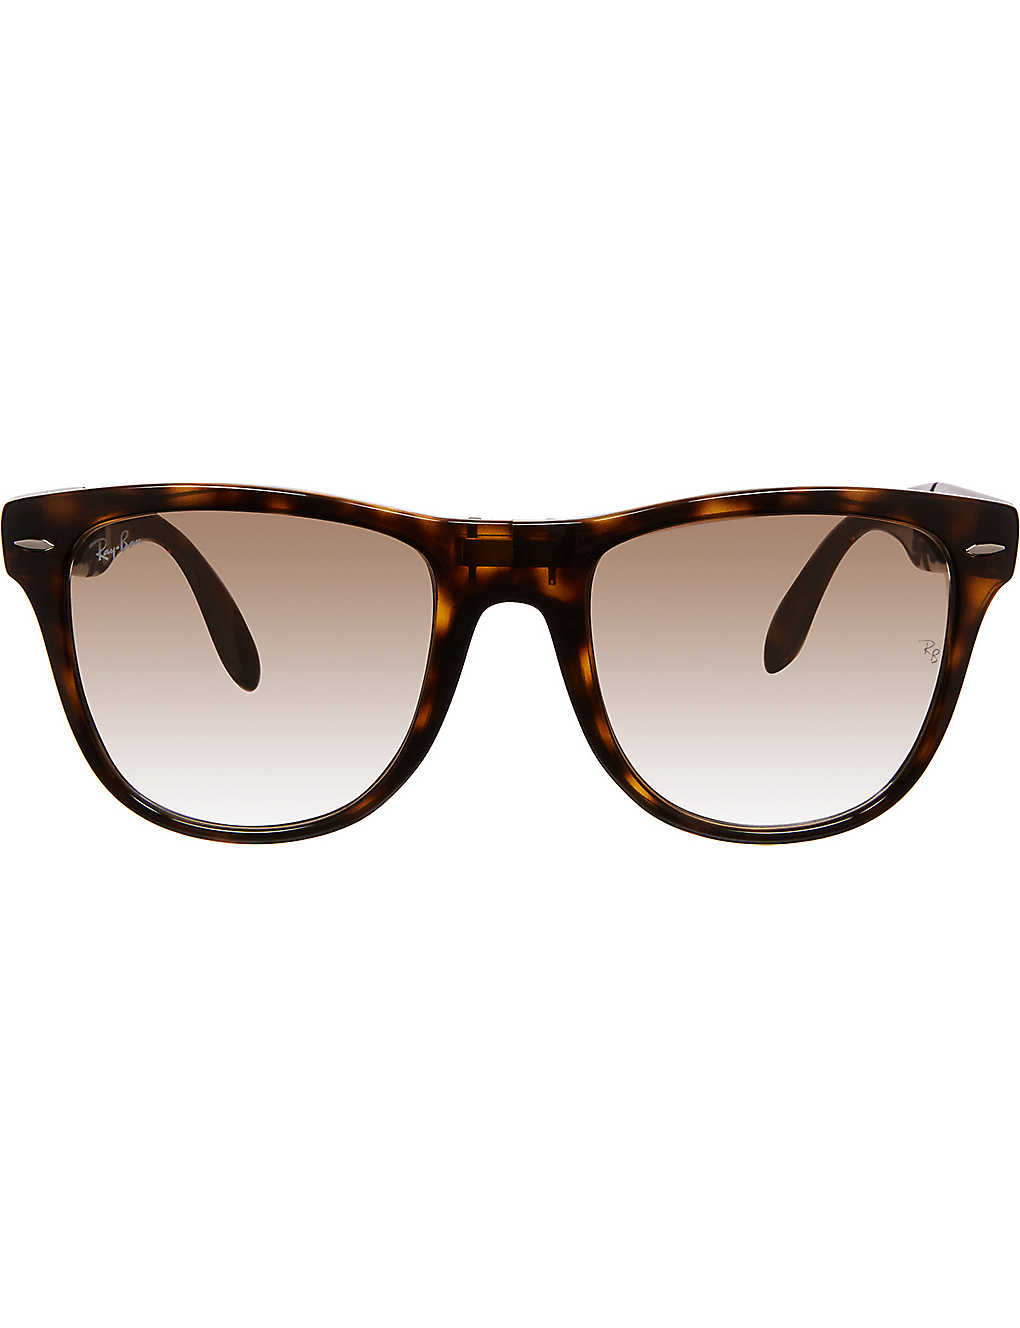 59b482f5864dd RAY-BAN - Wayfarer Folding Classic square sunglasses RB4105 50 ...